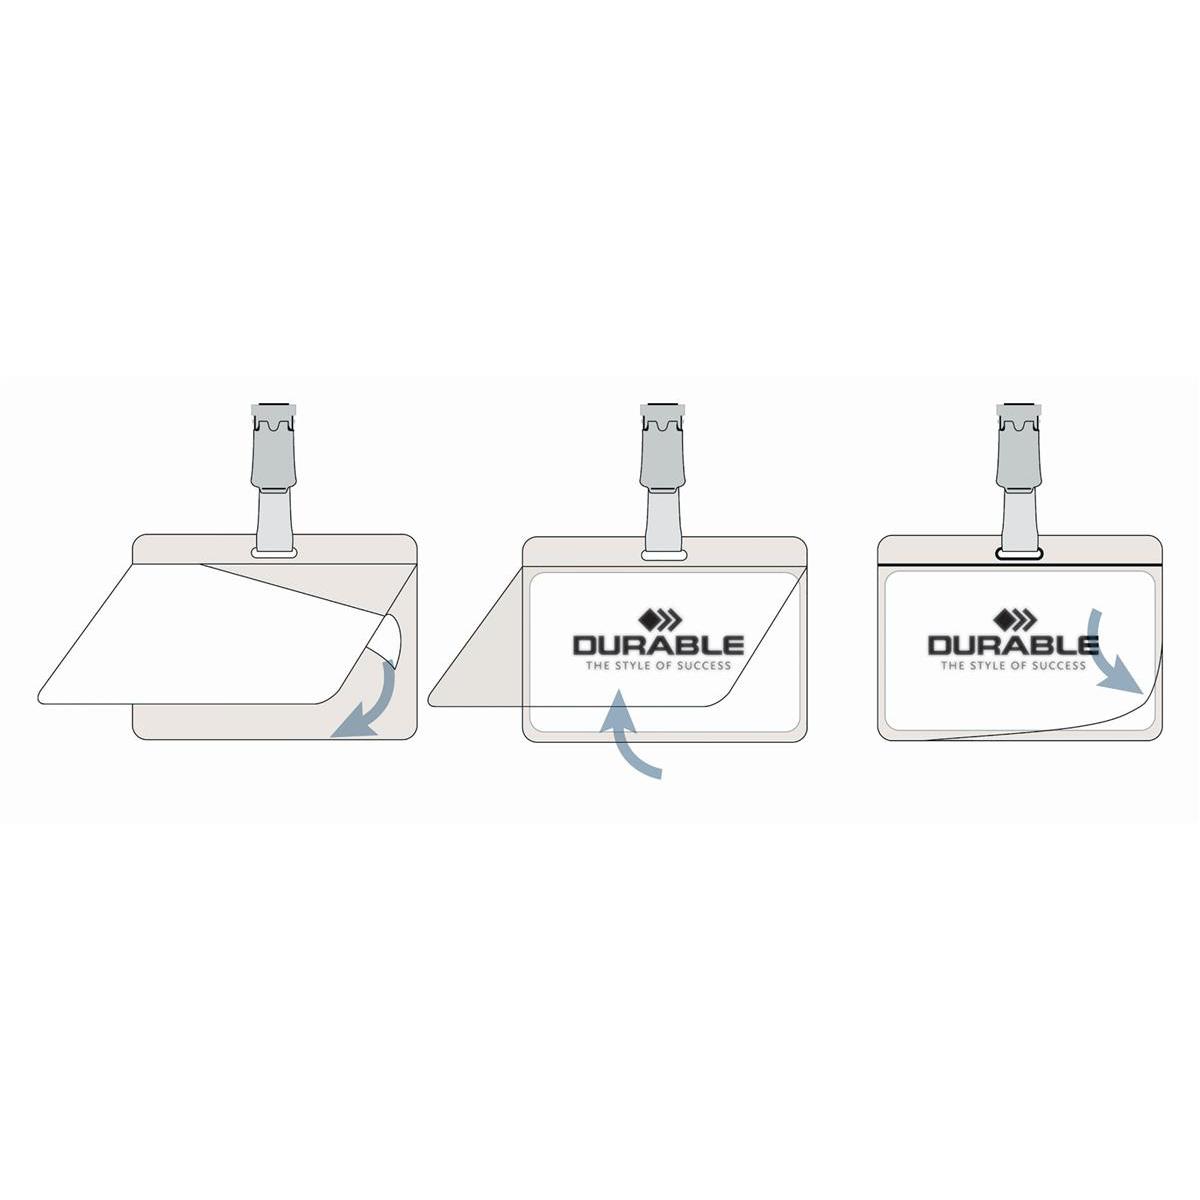 Durable Name Badges Self Laminating Self Adhesive W90xH54mm Transparent Ref 8102 [Pack 25]